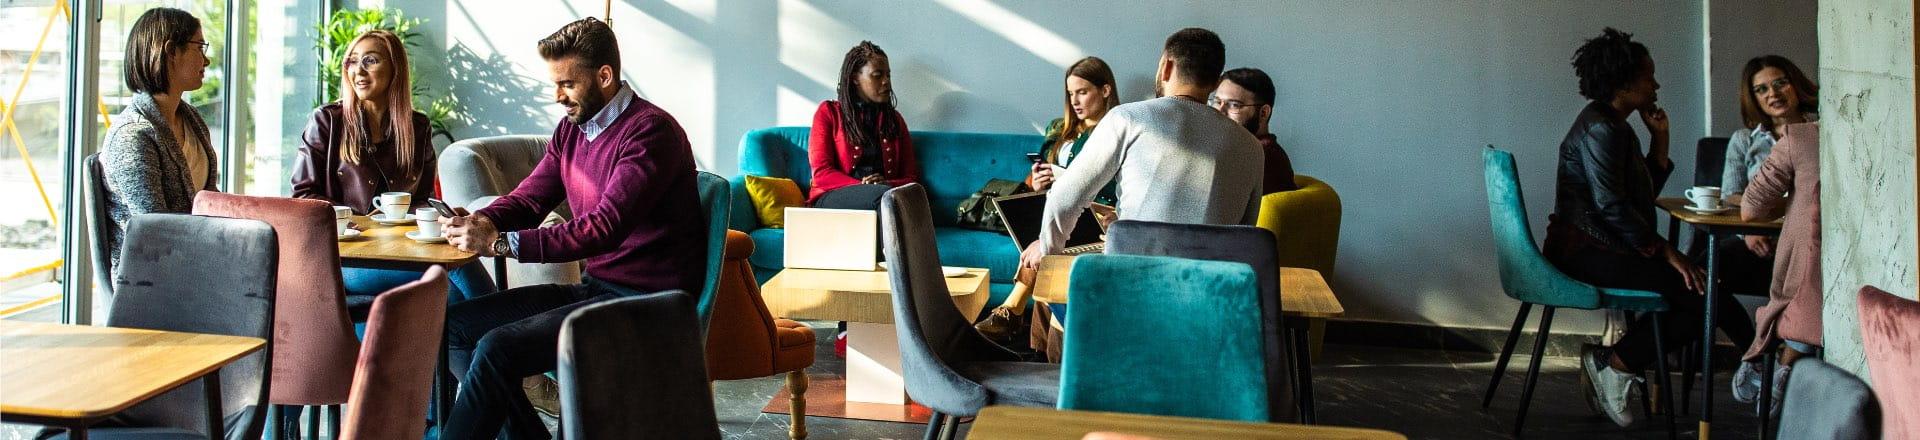 Business professionals having tea